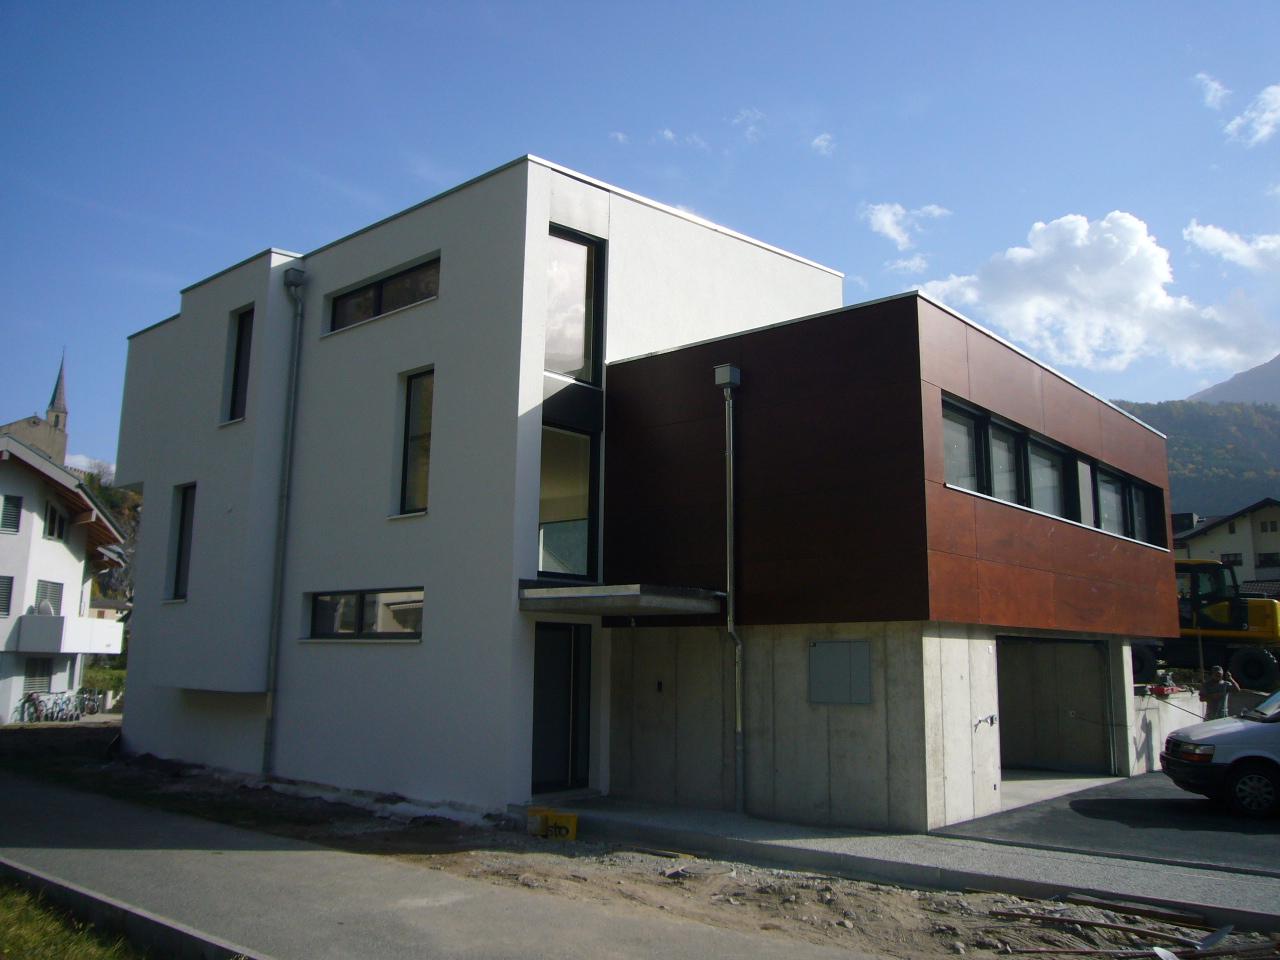 EFH in Raron, Baujahr 2008